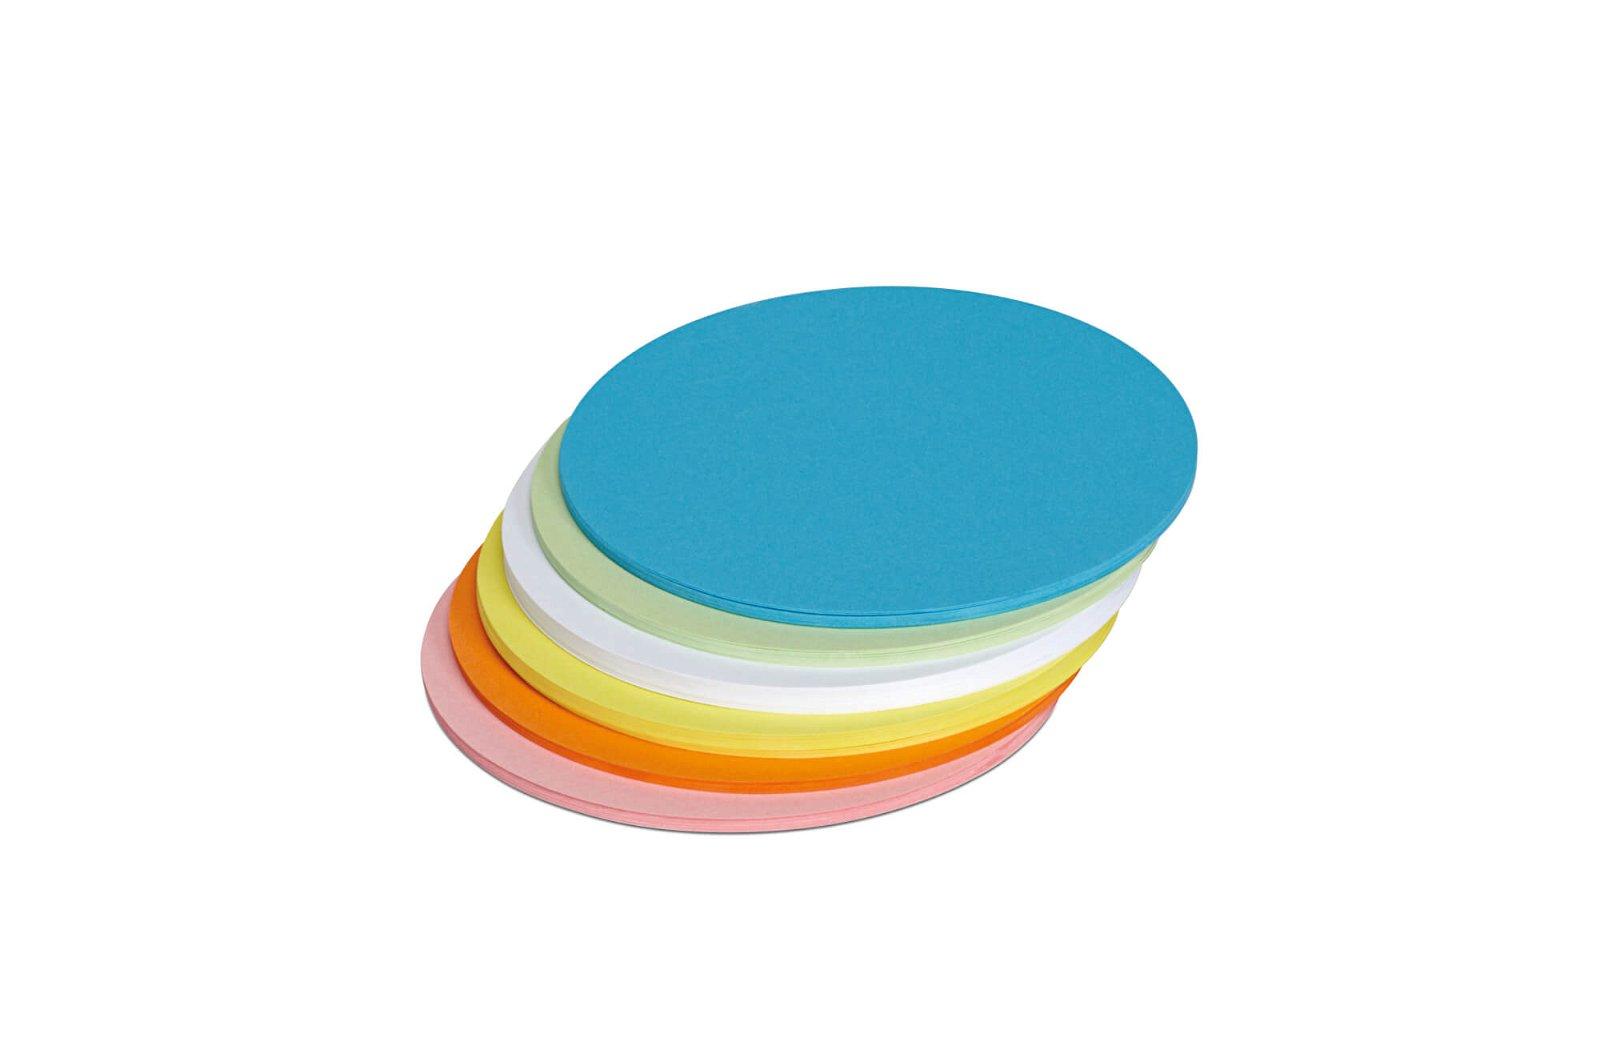 Moderationskarten rund, Ø 13,5 cm, 120 St./Pack, farbig sortiert